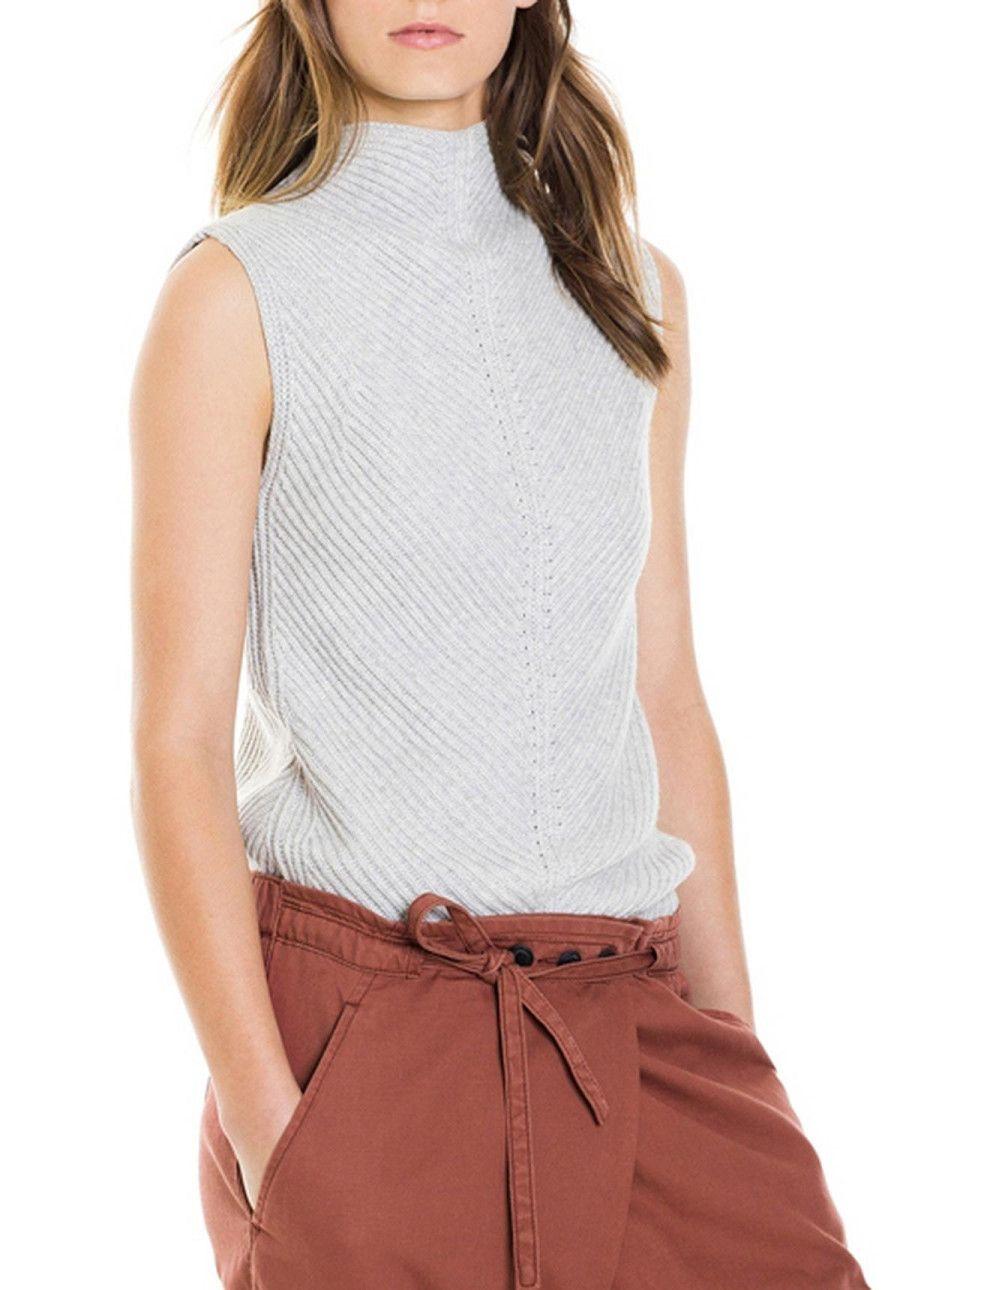 Rib Deflected Sleeveless Knit | David Jones | Fashion ...